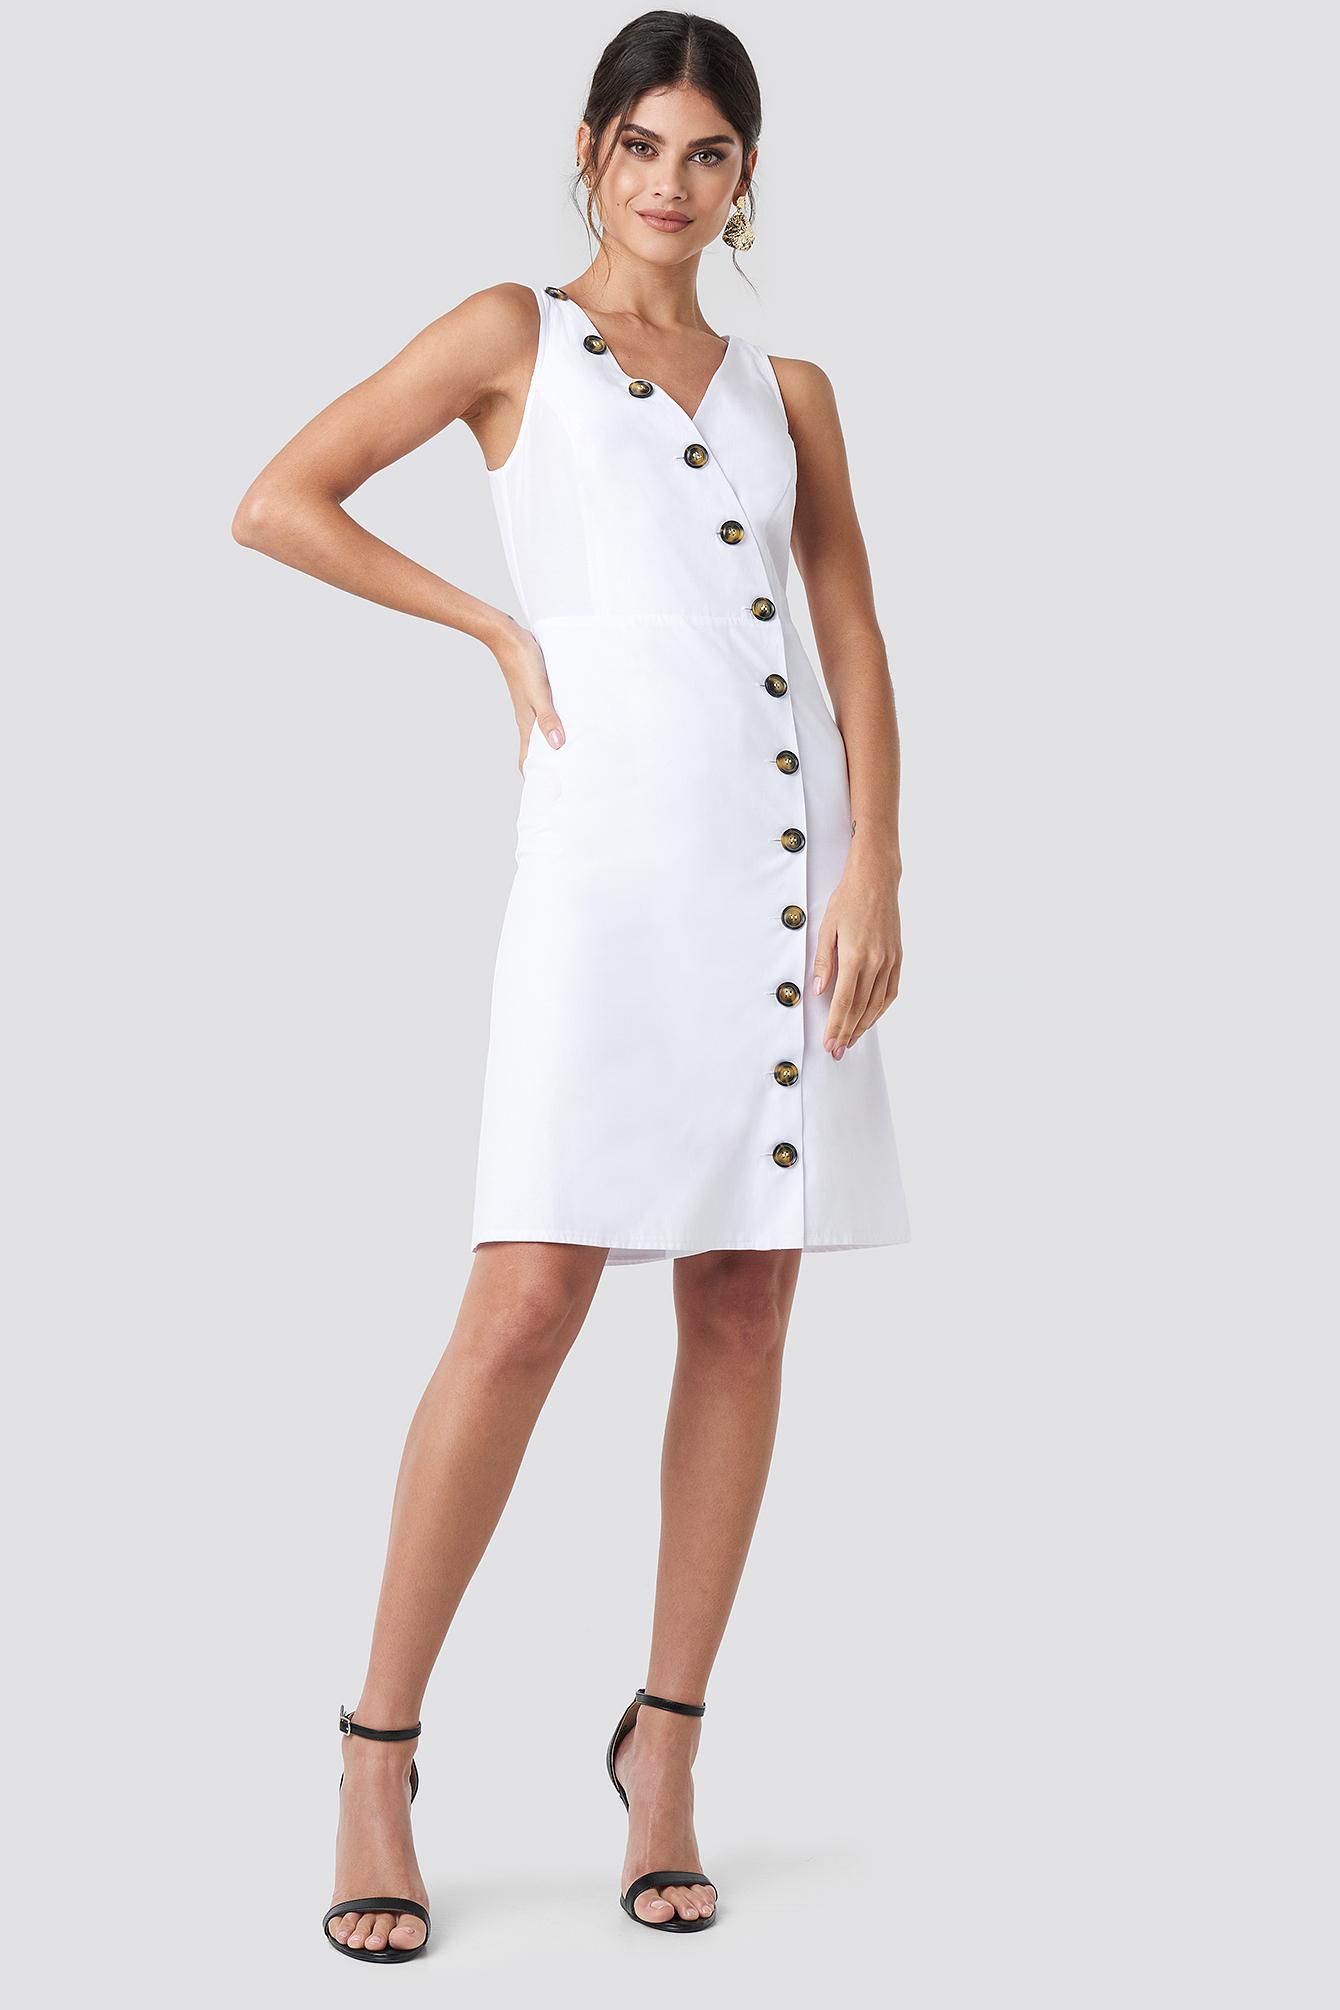 Buttoned Detail Dress NA-KD.COM